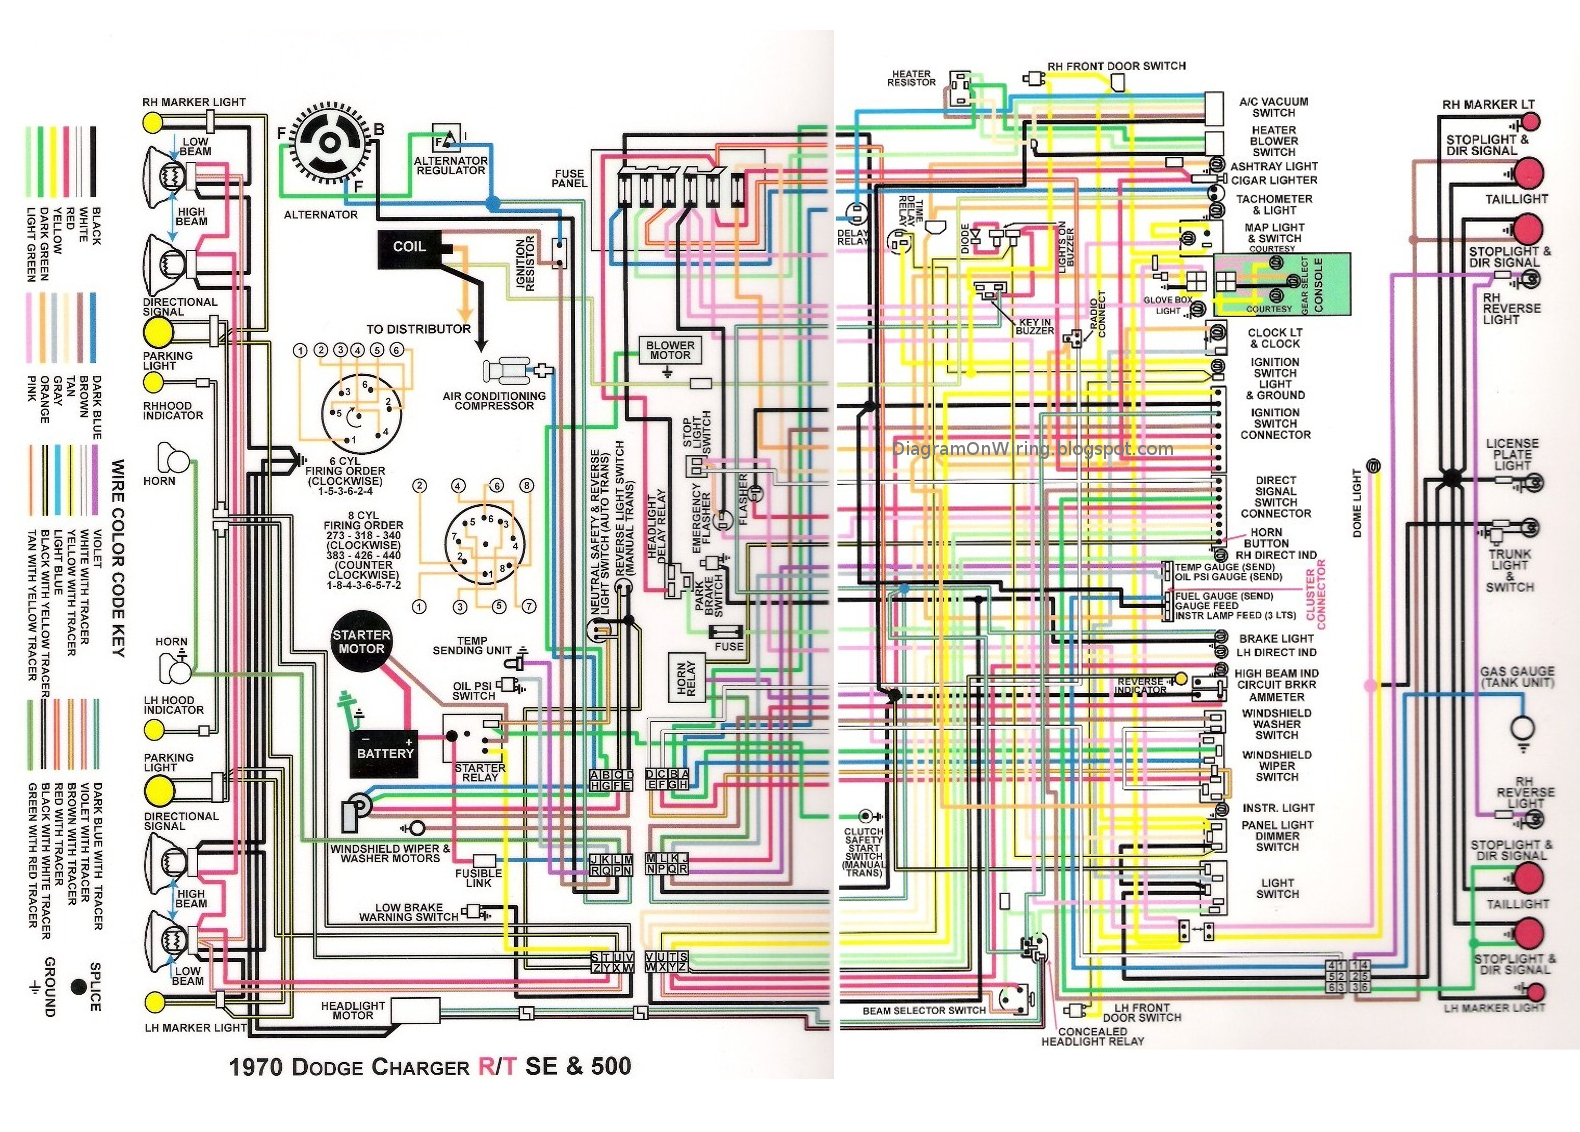 2013 Dodge Dart Stereo Wiring Harness - Wiring Diagrams Schematics